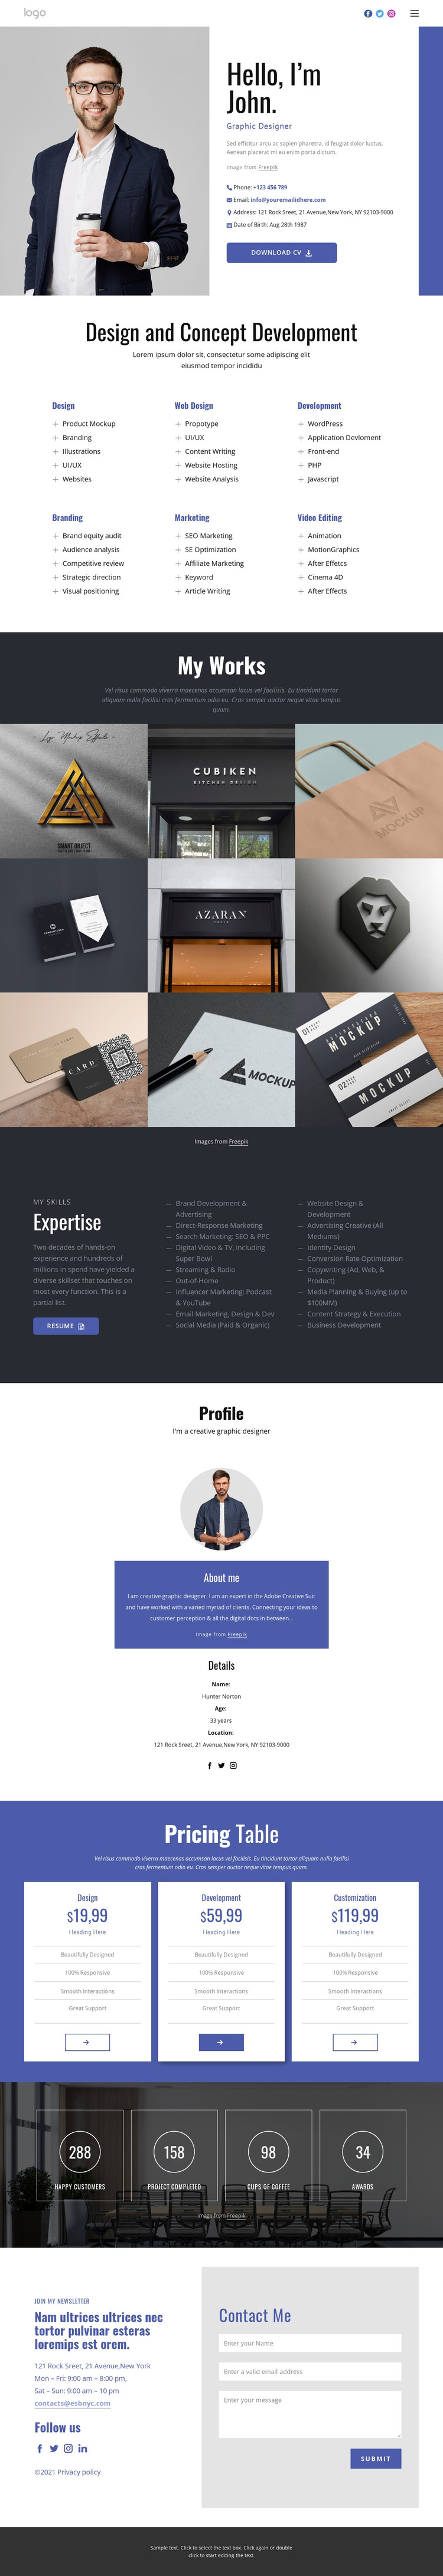 Conceptual design Web Design